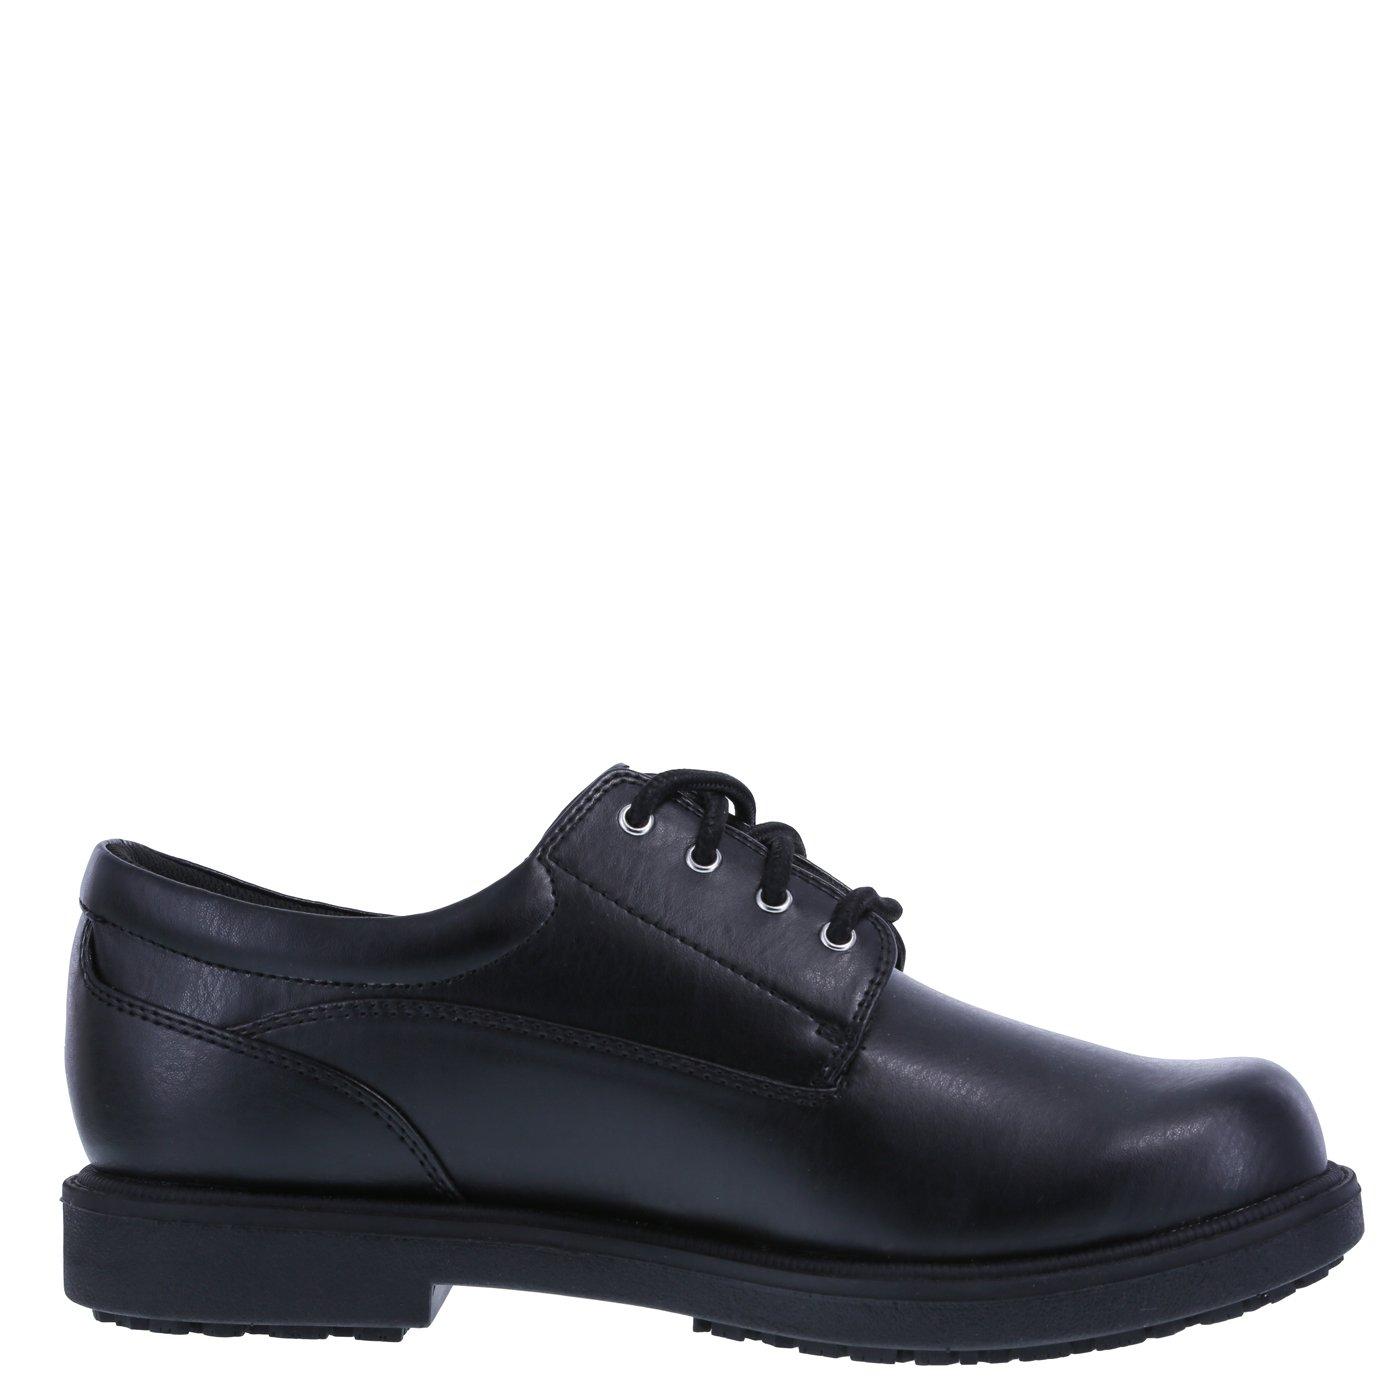 safeTstep Slip Resistant Women's Deidre US|Black Oxford B01J91HEE0 7.5 W US|Black Deidre b7b0f9